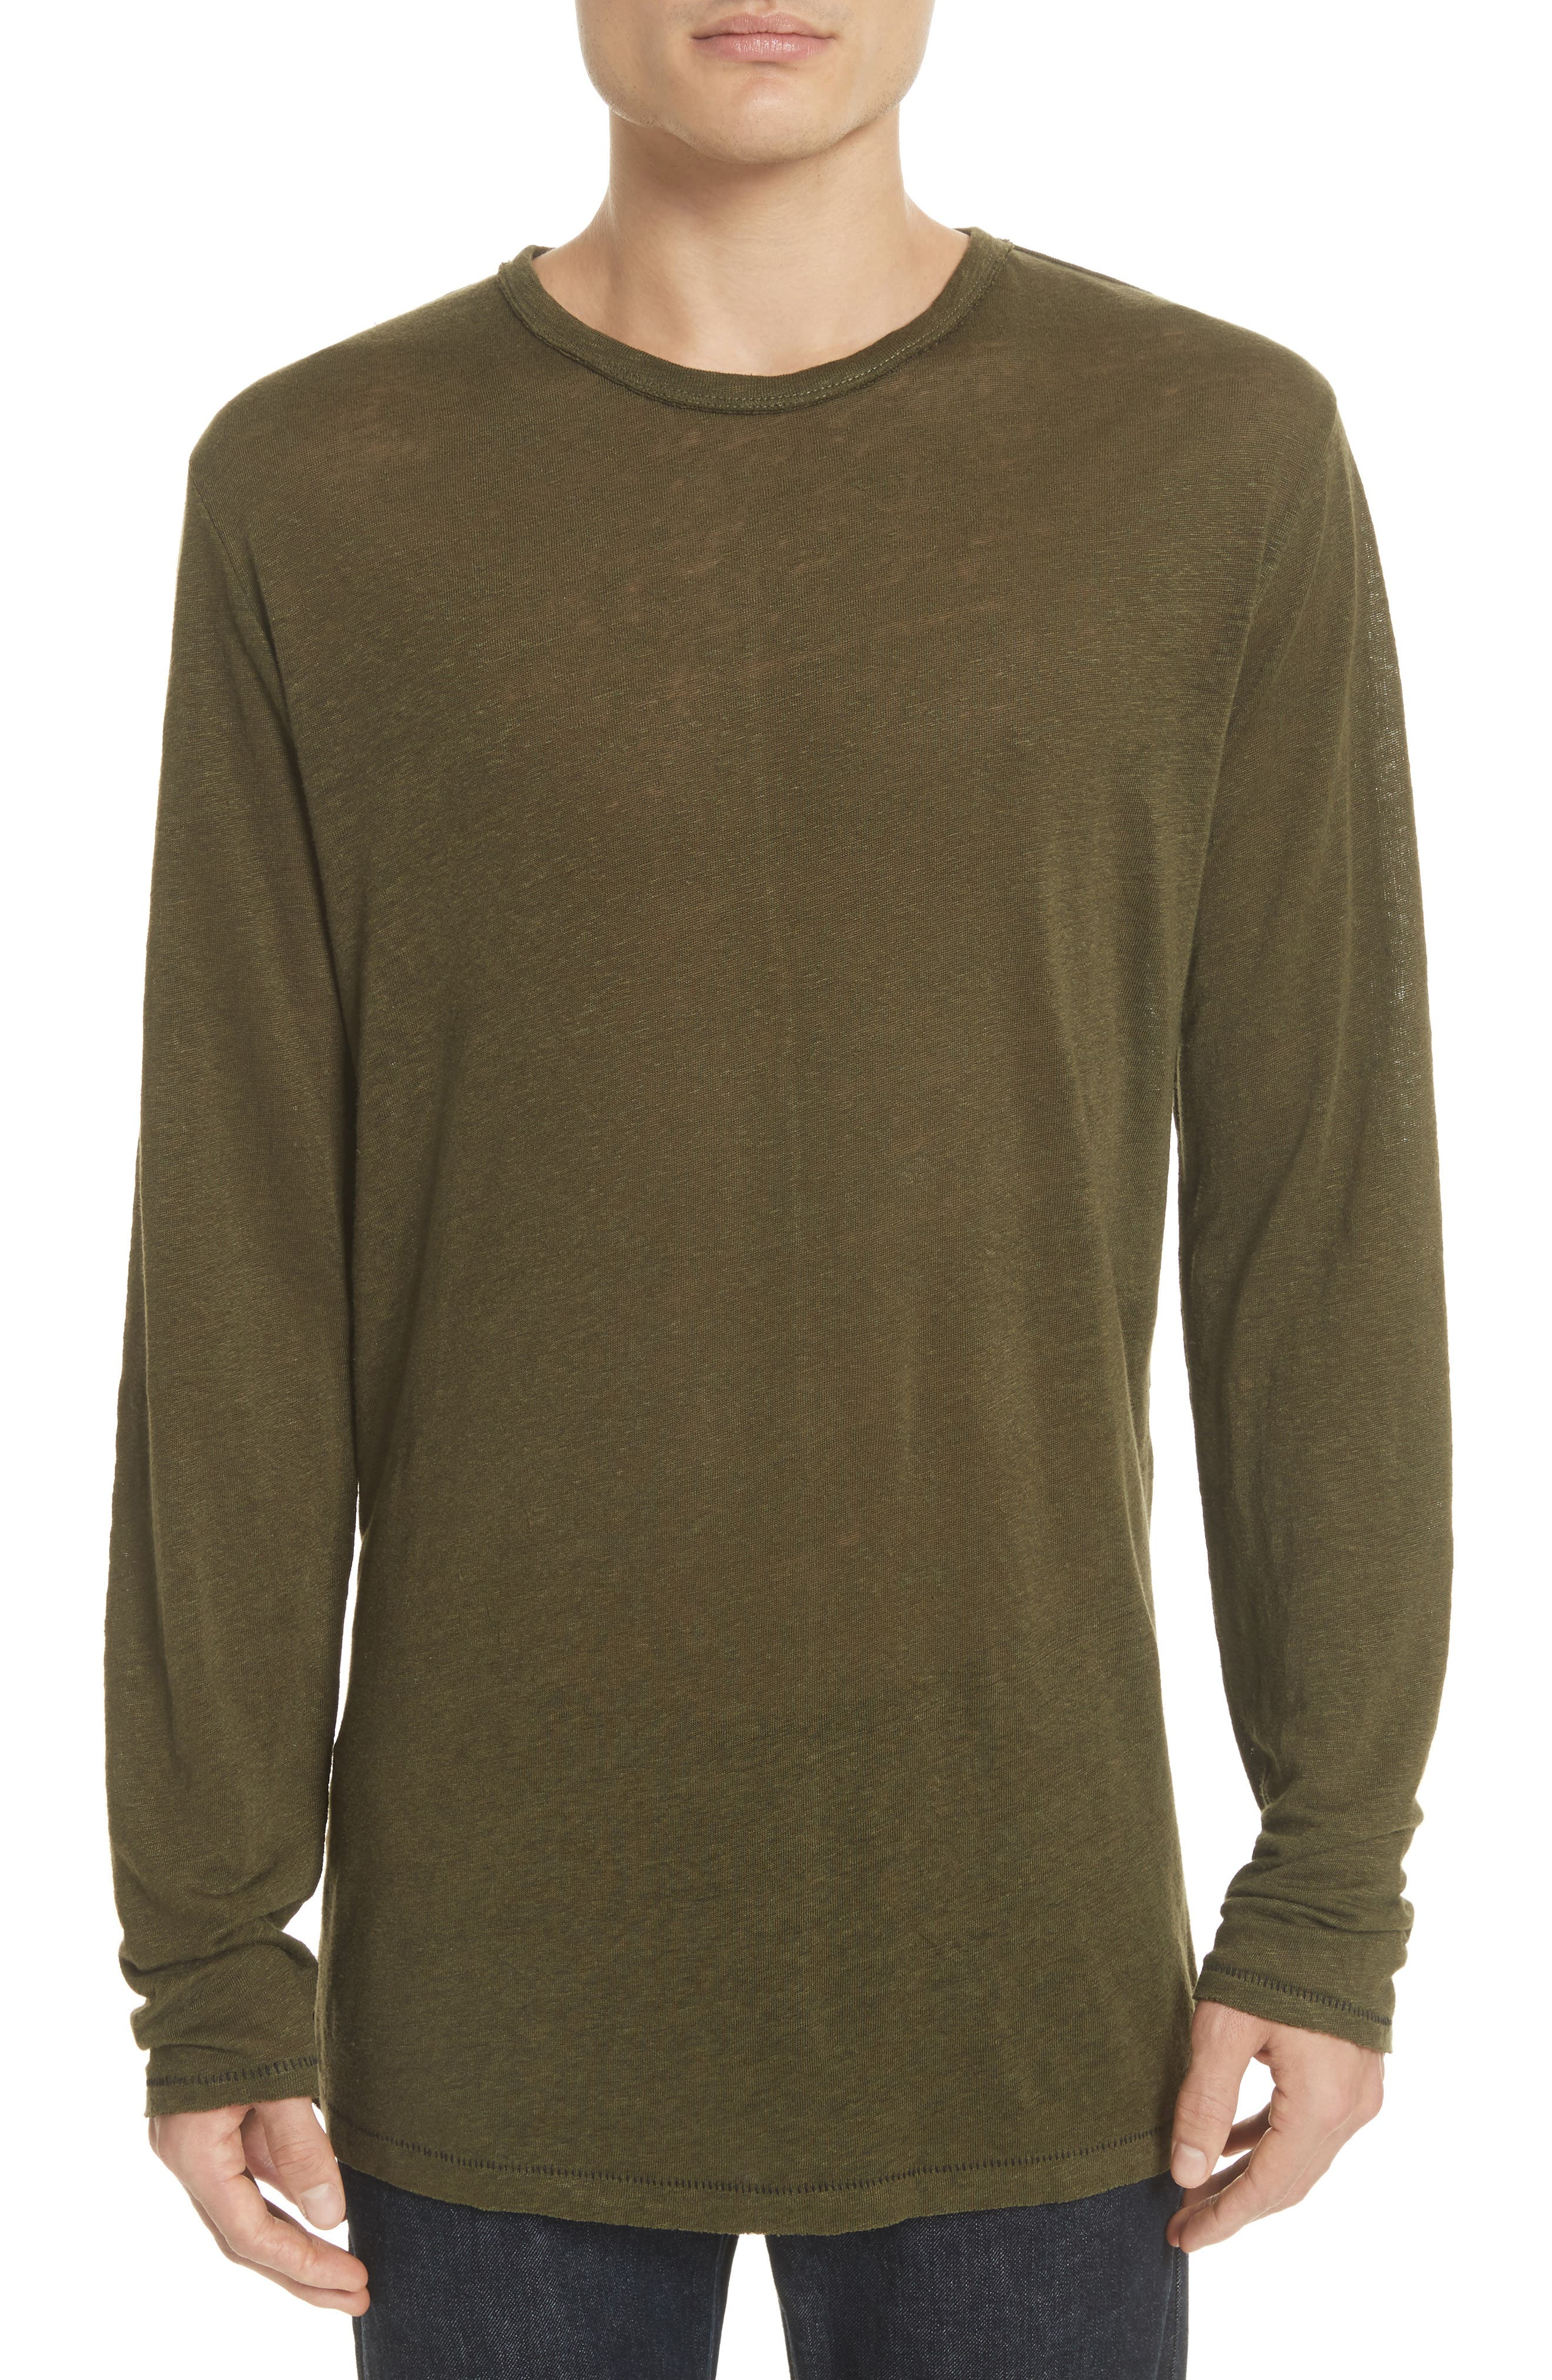 Owen Long Sleeve T-Shirt,                             Main thumbnail 1, color,                             Army